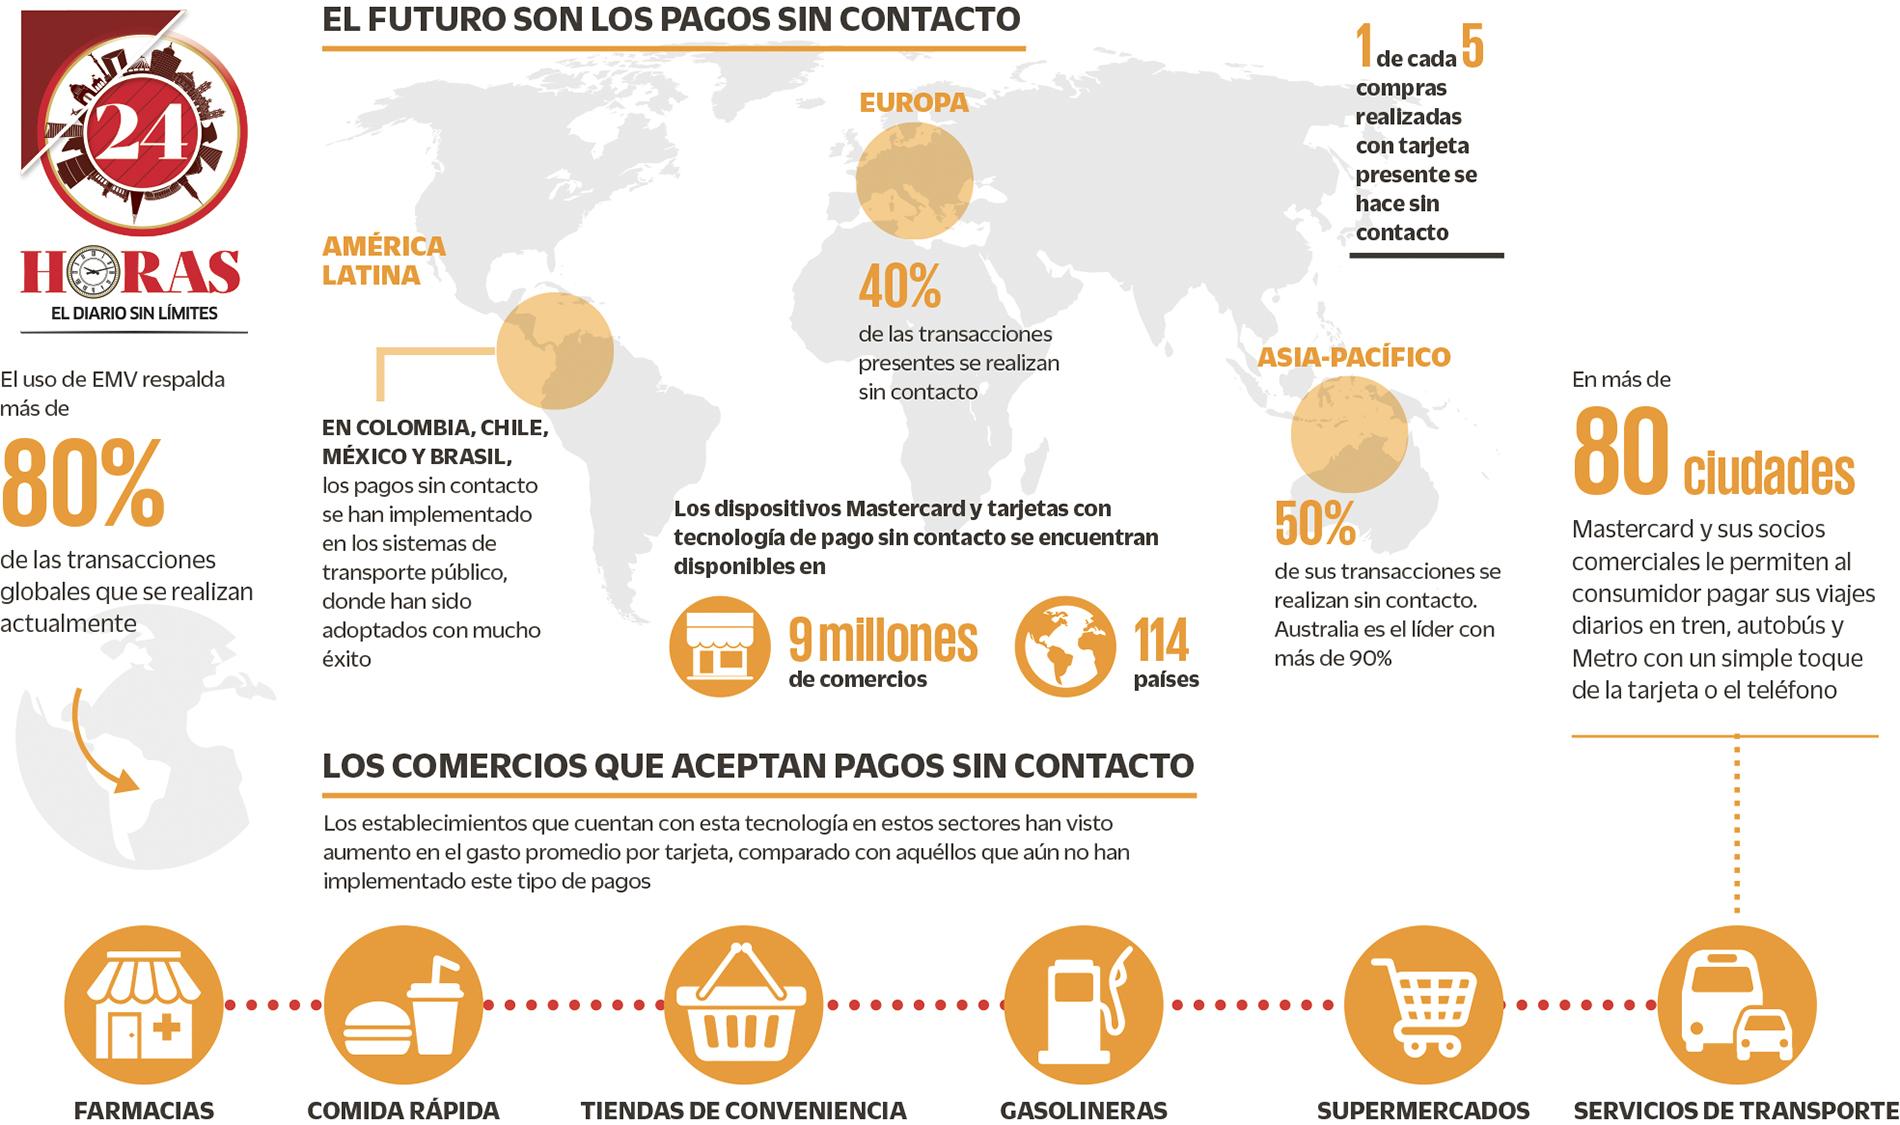 Pagos sin contacto, la tecnología que busca conquistar a México (+Infografía)